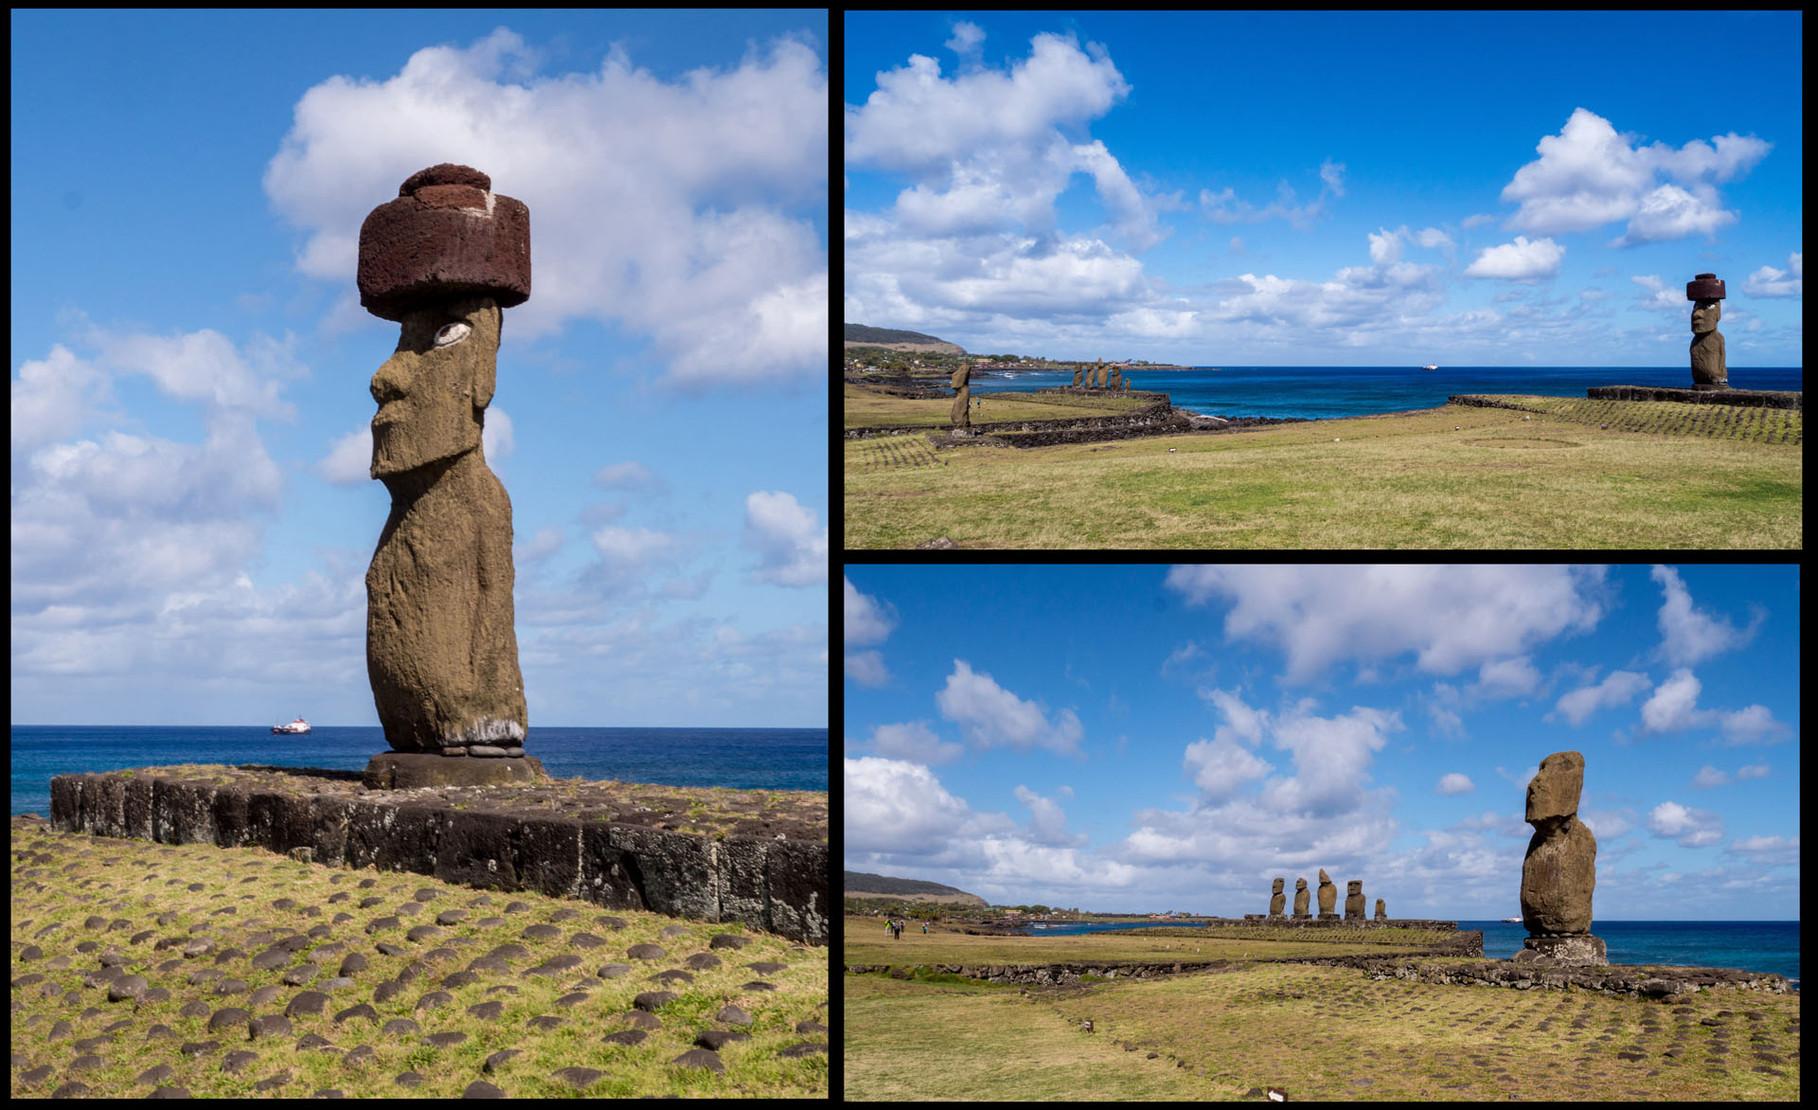 Moai´s near Hanga Roa (Tahai site), Easter island [Chile, 2014]